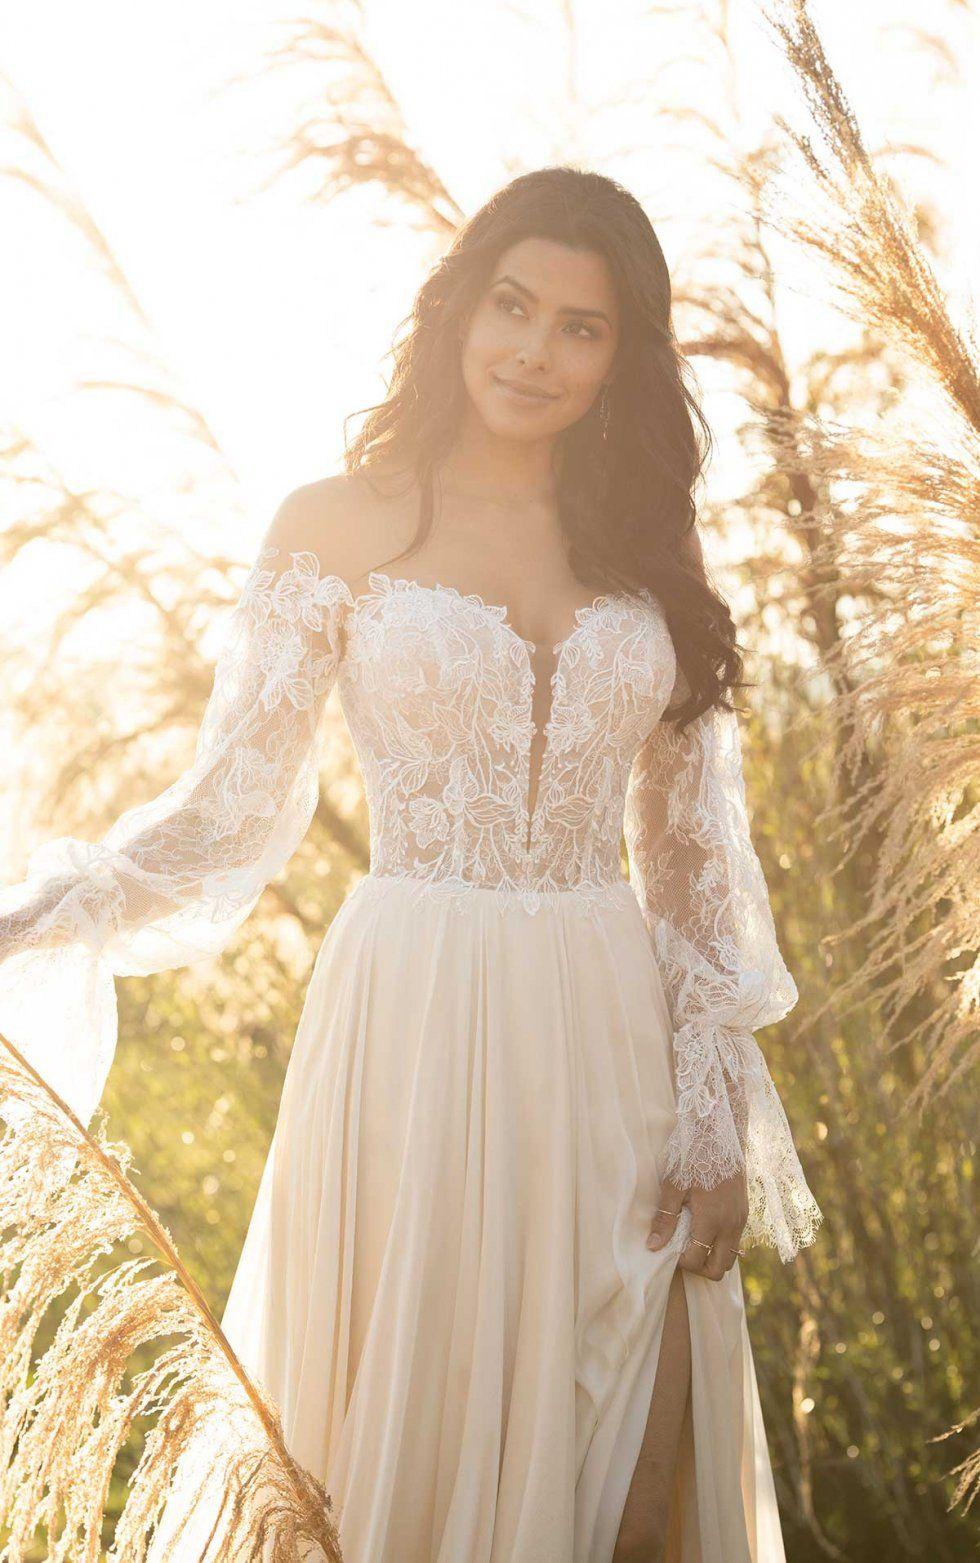 Stunning Boho Wedding Dress All Who Wander Boho Wedding Gown Wedding Dresses Whimsical Boho Chic Wedding Dress [ 1563 x 980 Pixel ]